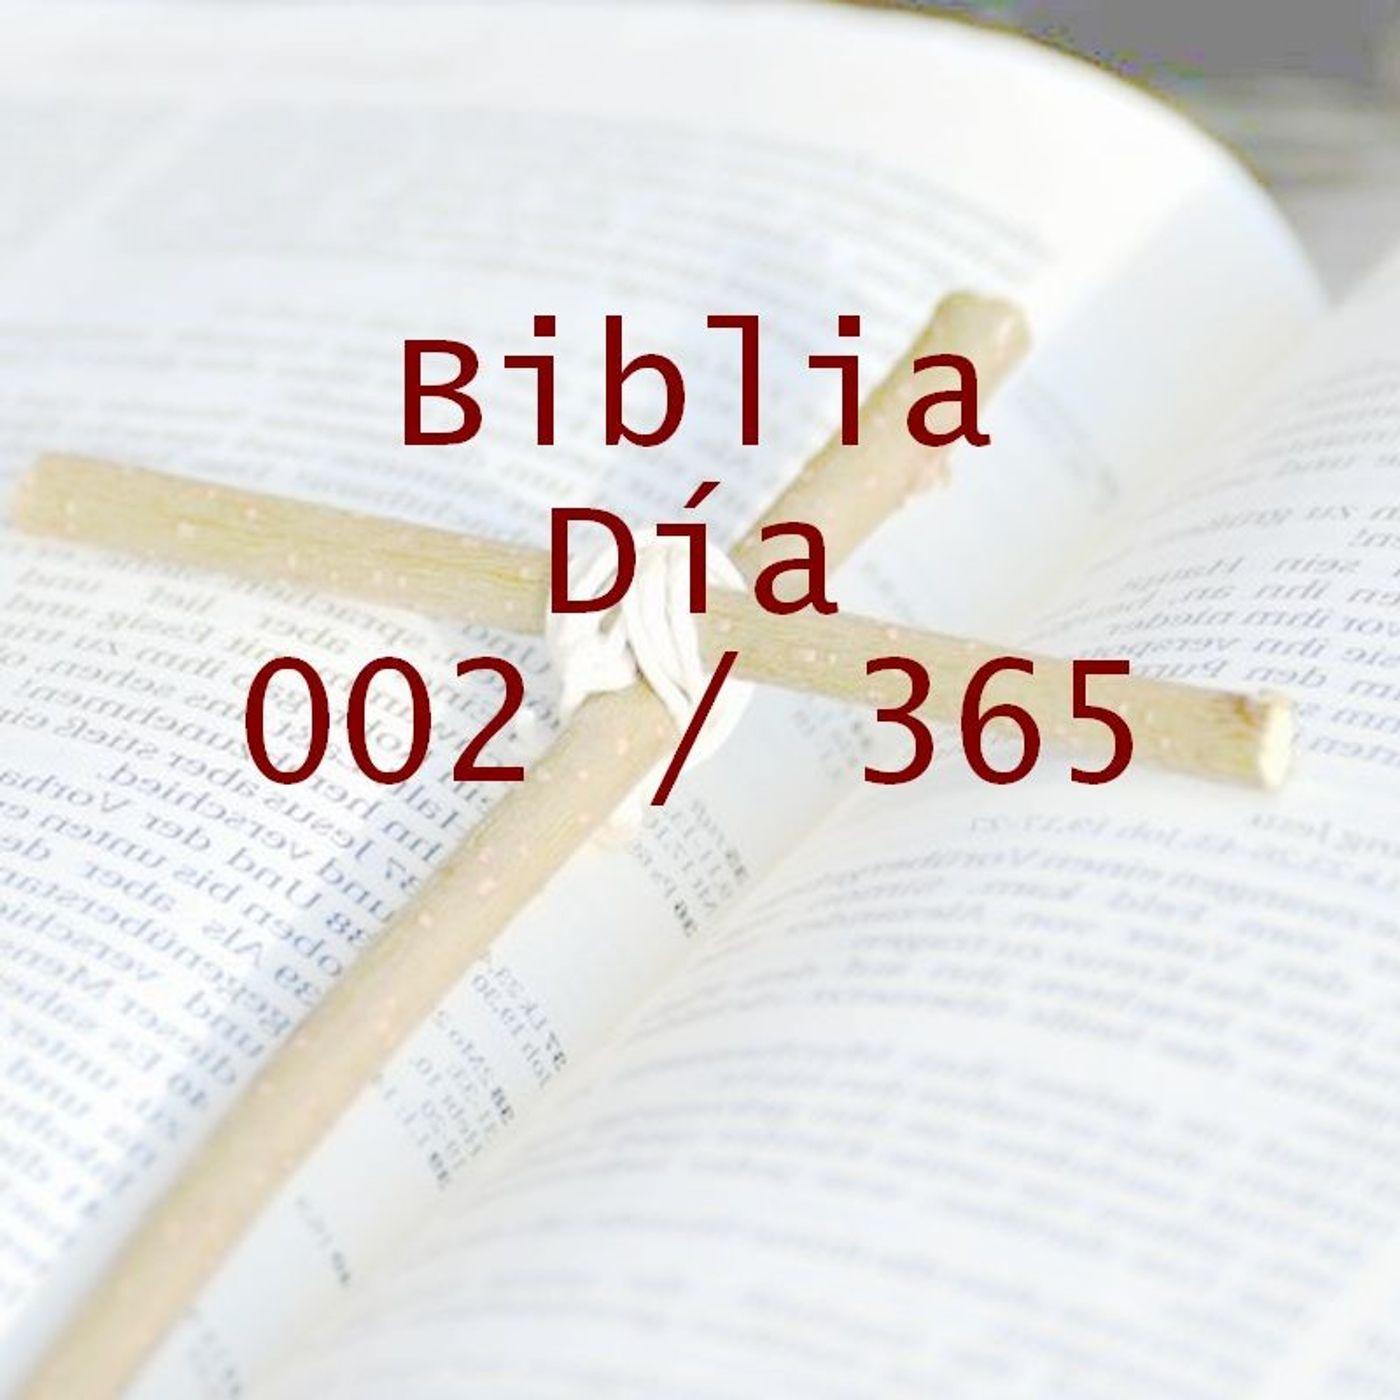 365 dias para la Biblia - Dia 002